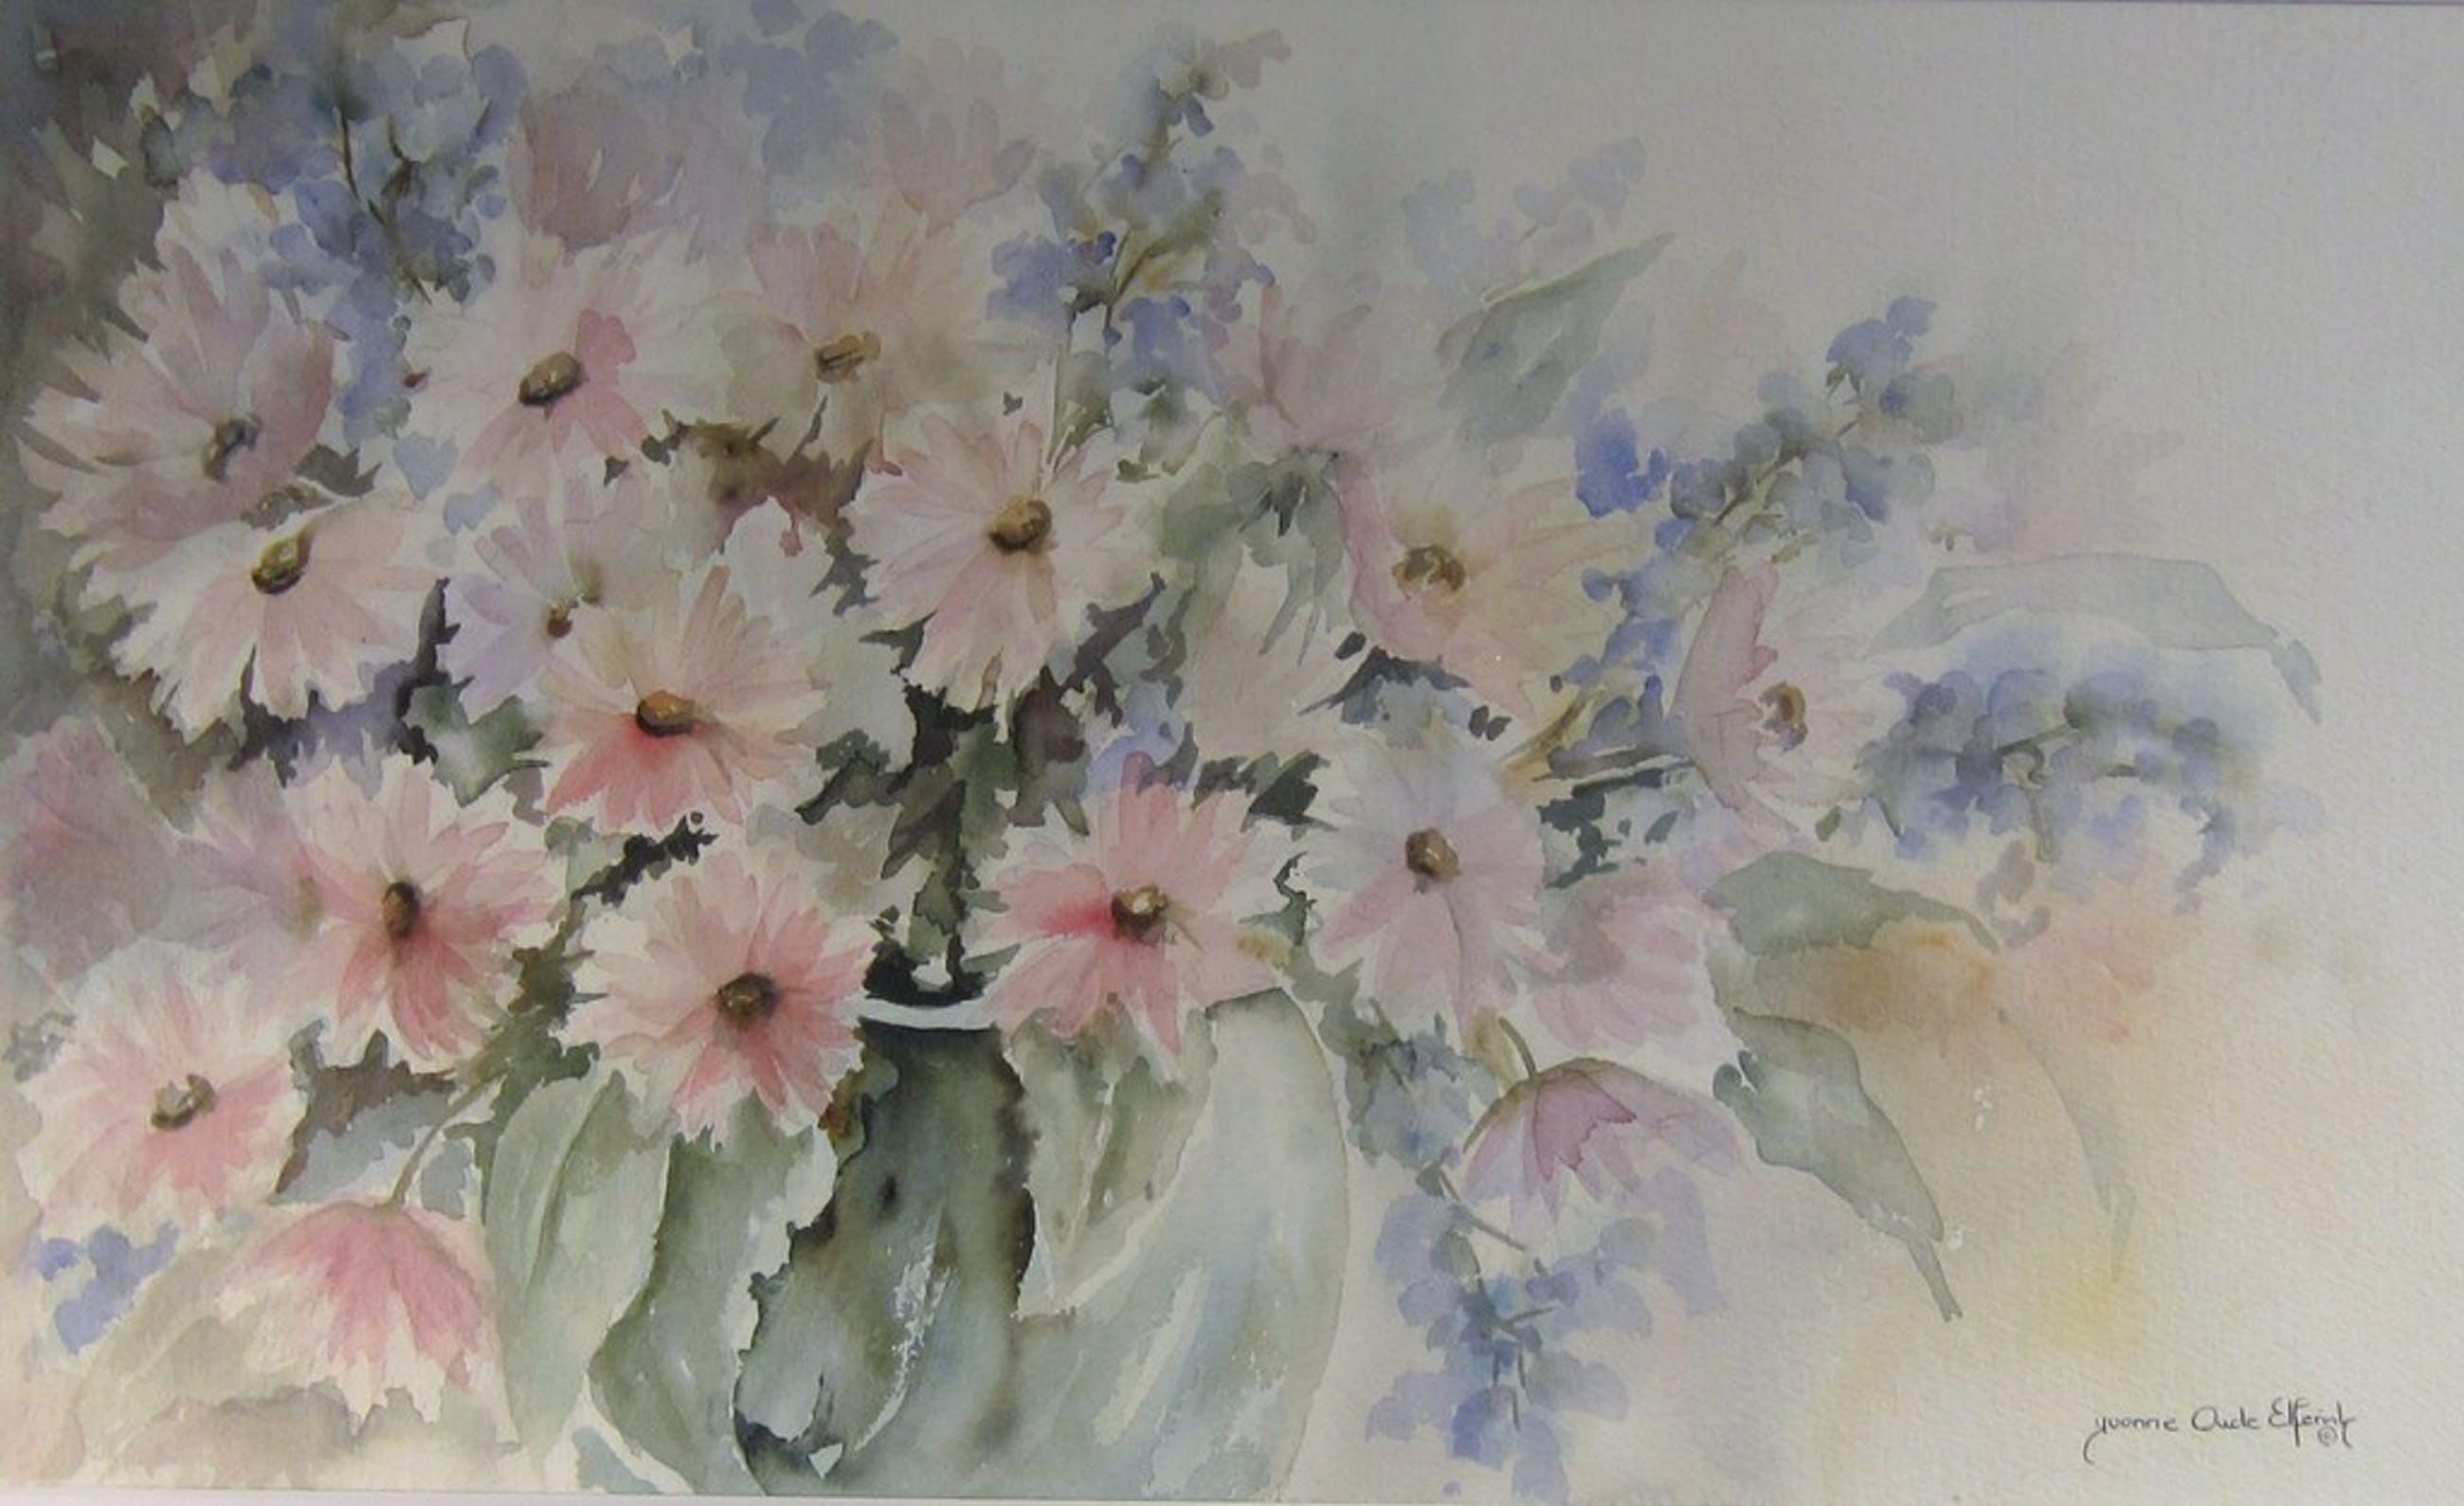 Yvonne Oude Elferink - Aquarel bloemstilleven kopen? Bied vanaf 1!